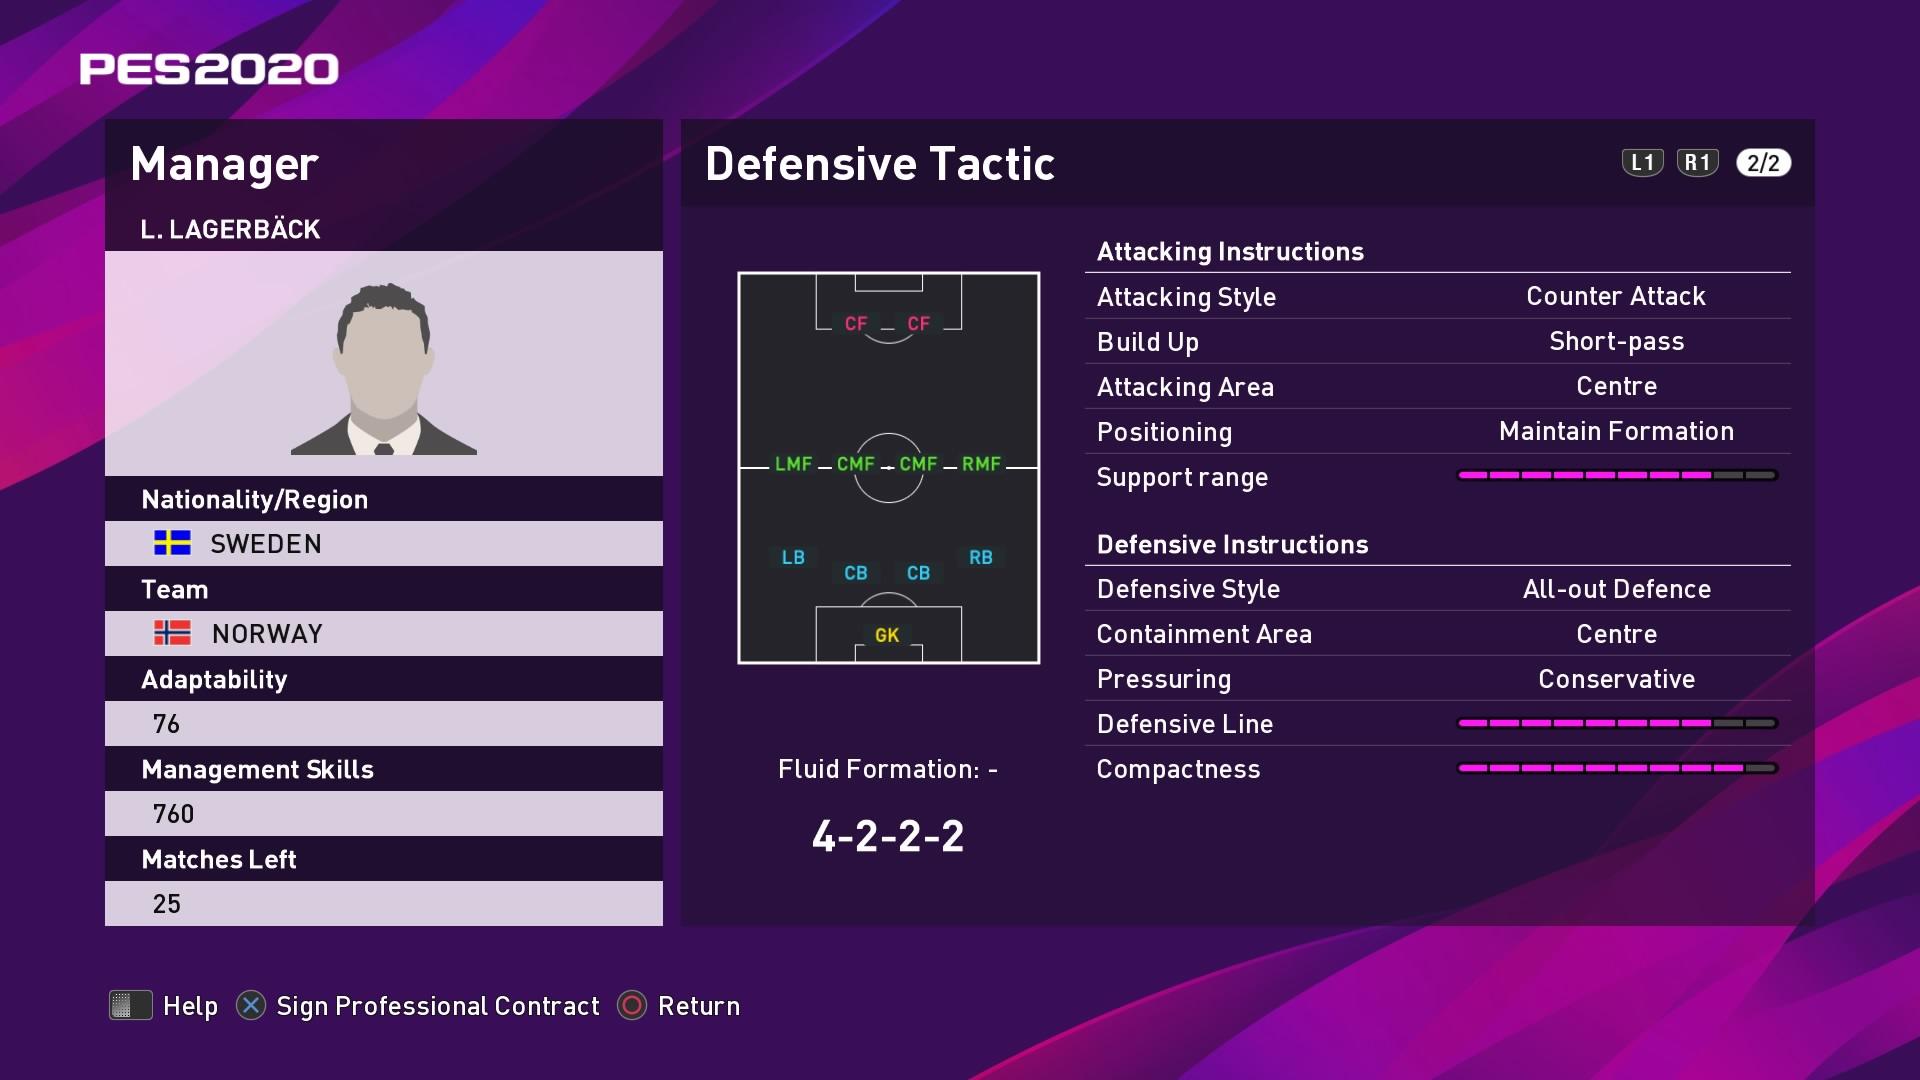 L. Lagerbäck (Lars Lagerbäck) Defensive Tactic in PES 2020 myClub